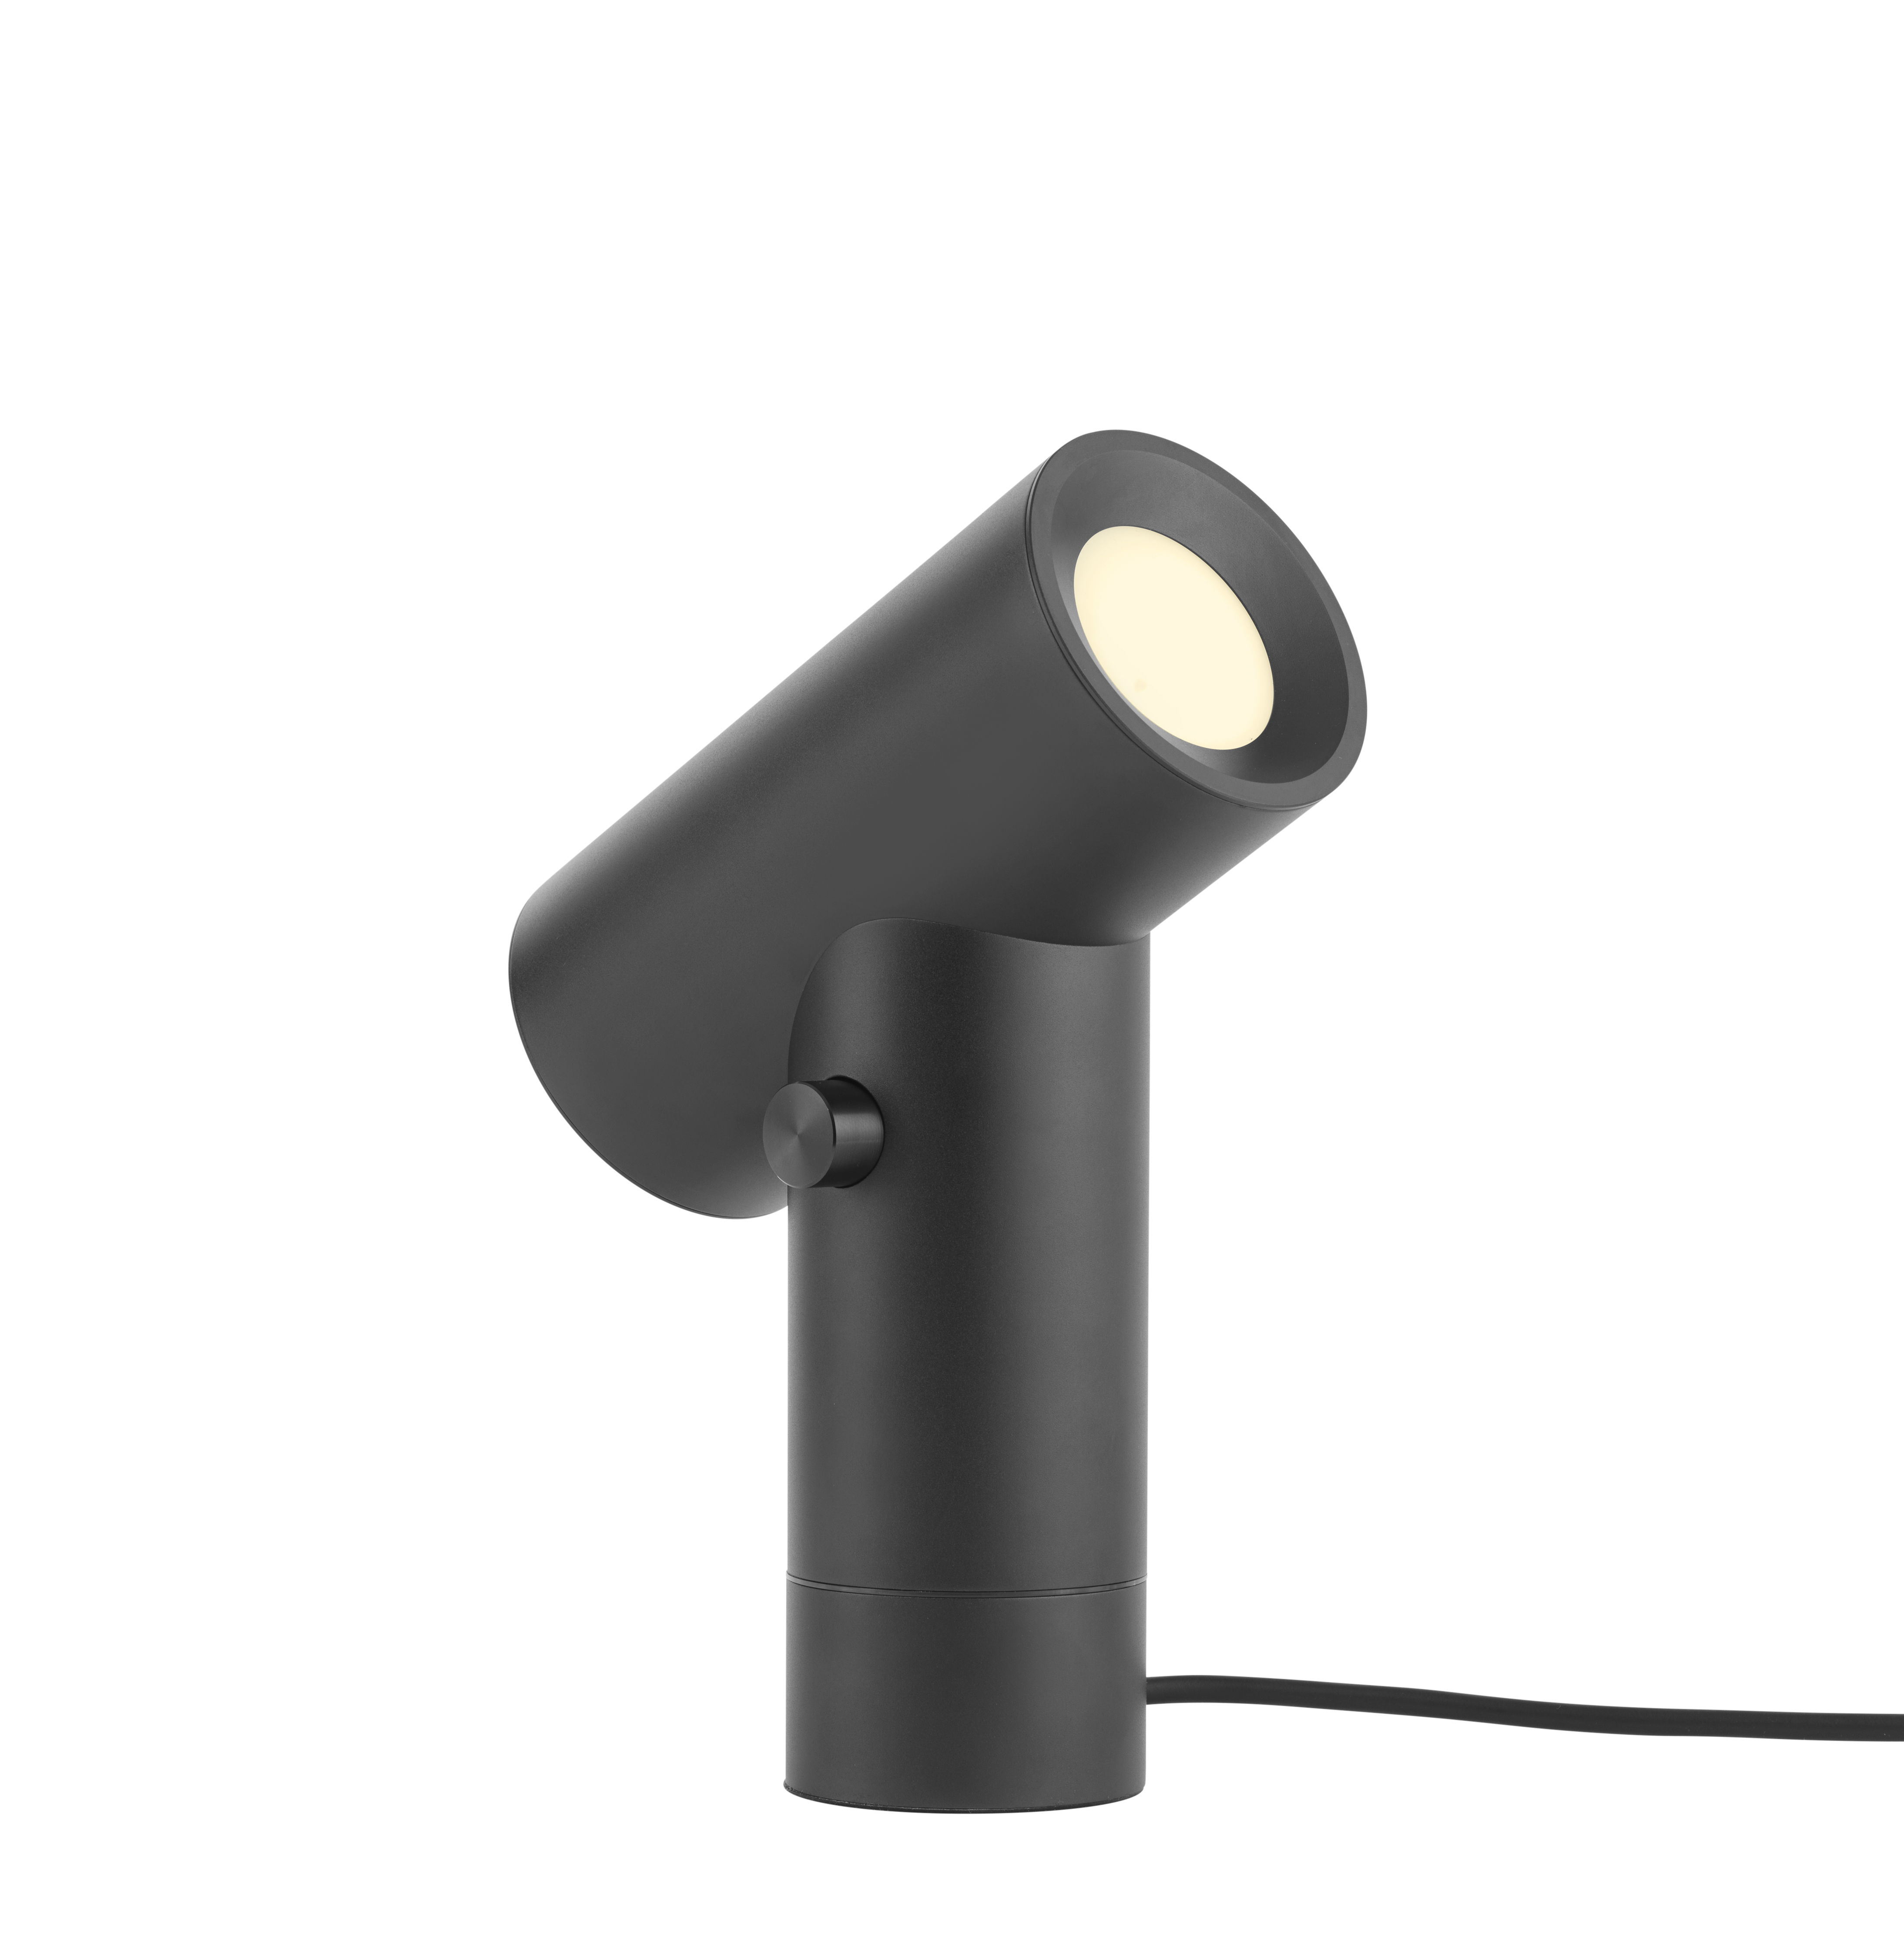 Luminaire - Lampes de table - Lampe de table Beam / Double source lumineuse - Base rotative - Muuto - Noir - Aluminium anodisé, PVC